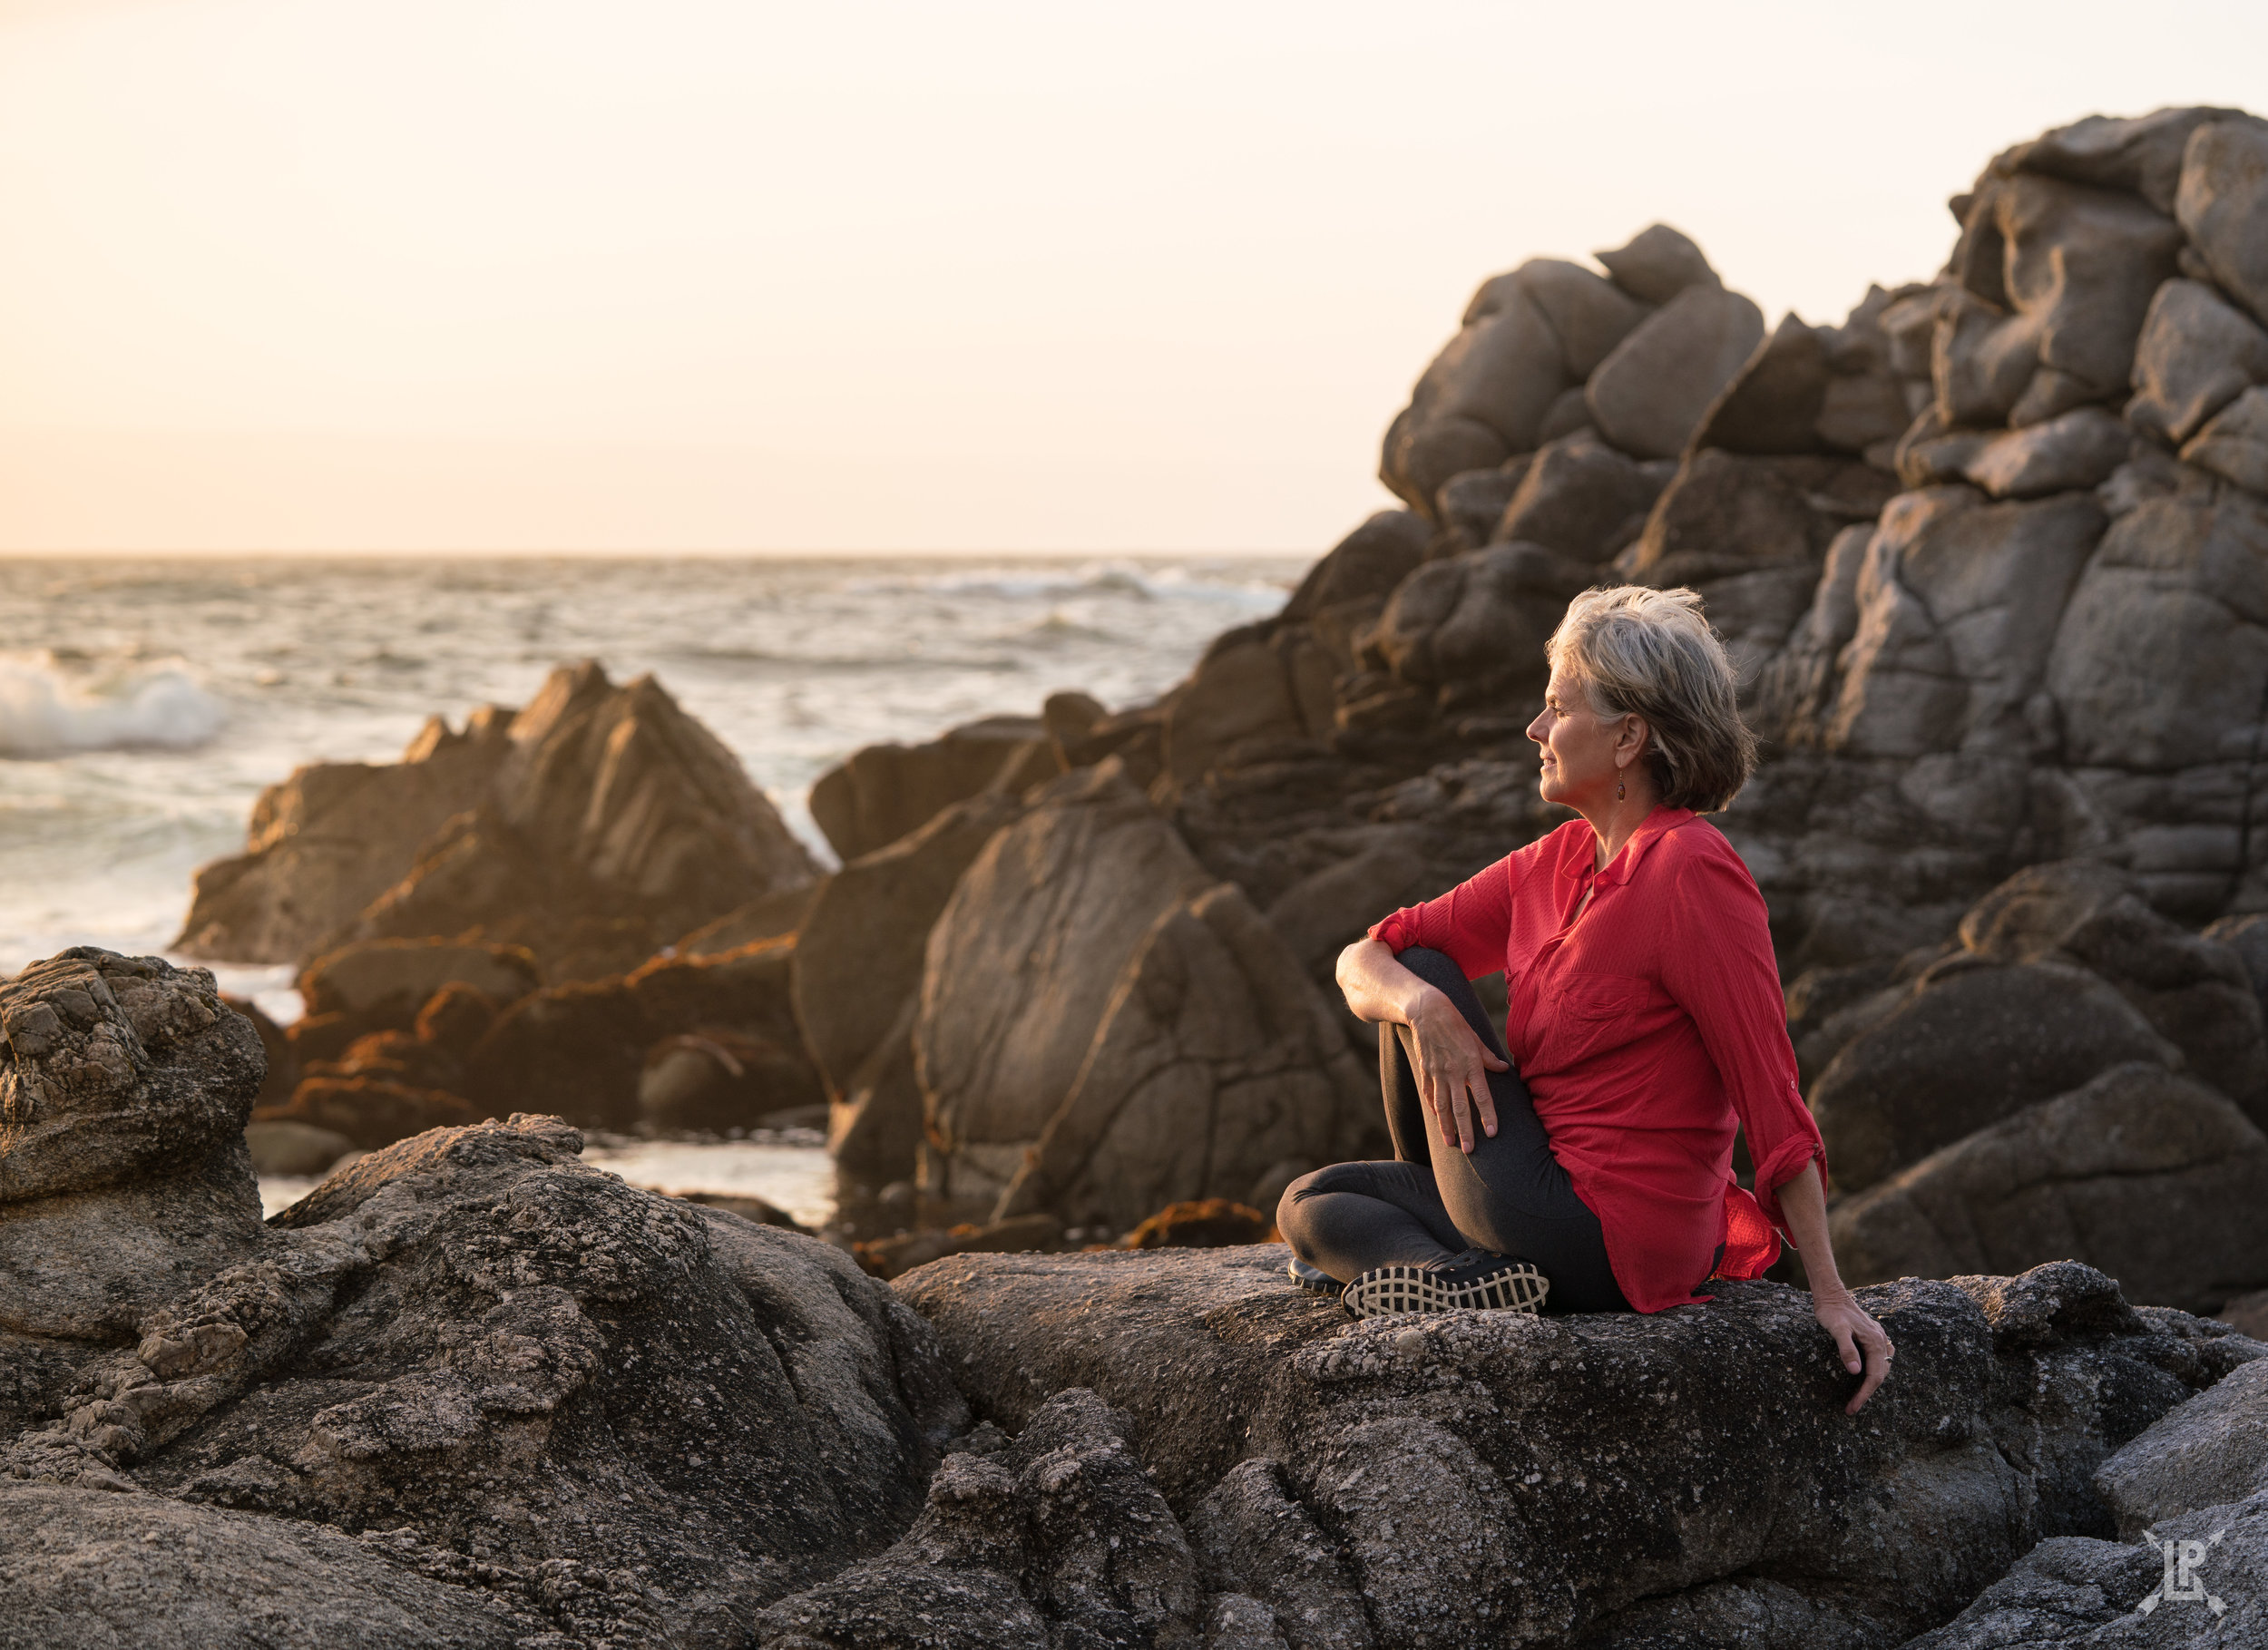 Portrait of Karen from Feel Better Yoga   Sony A7RIII ,  90MM G  | f/4.5, 1/120, ISO 320